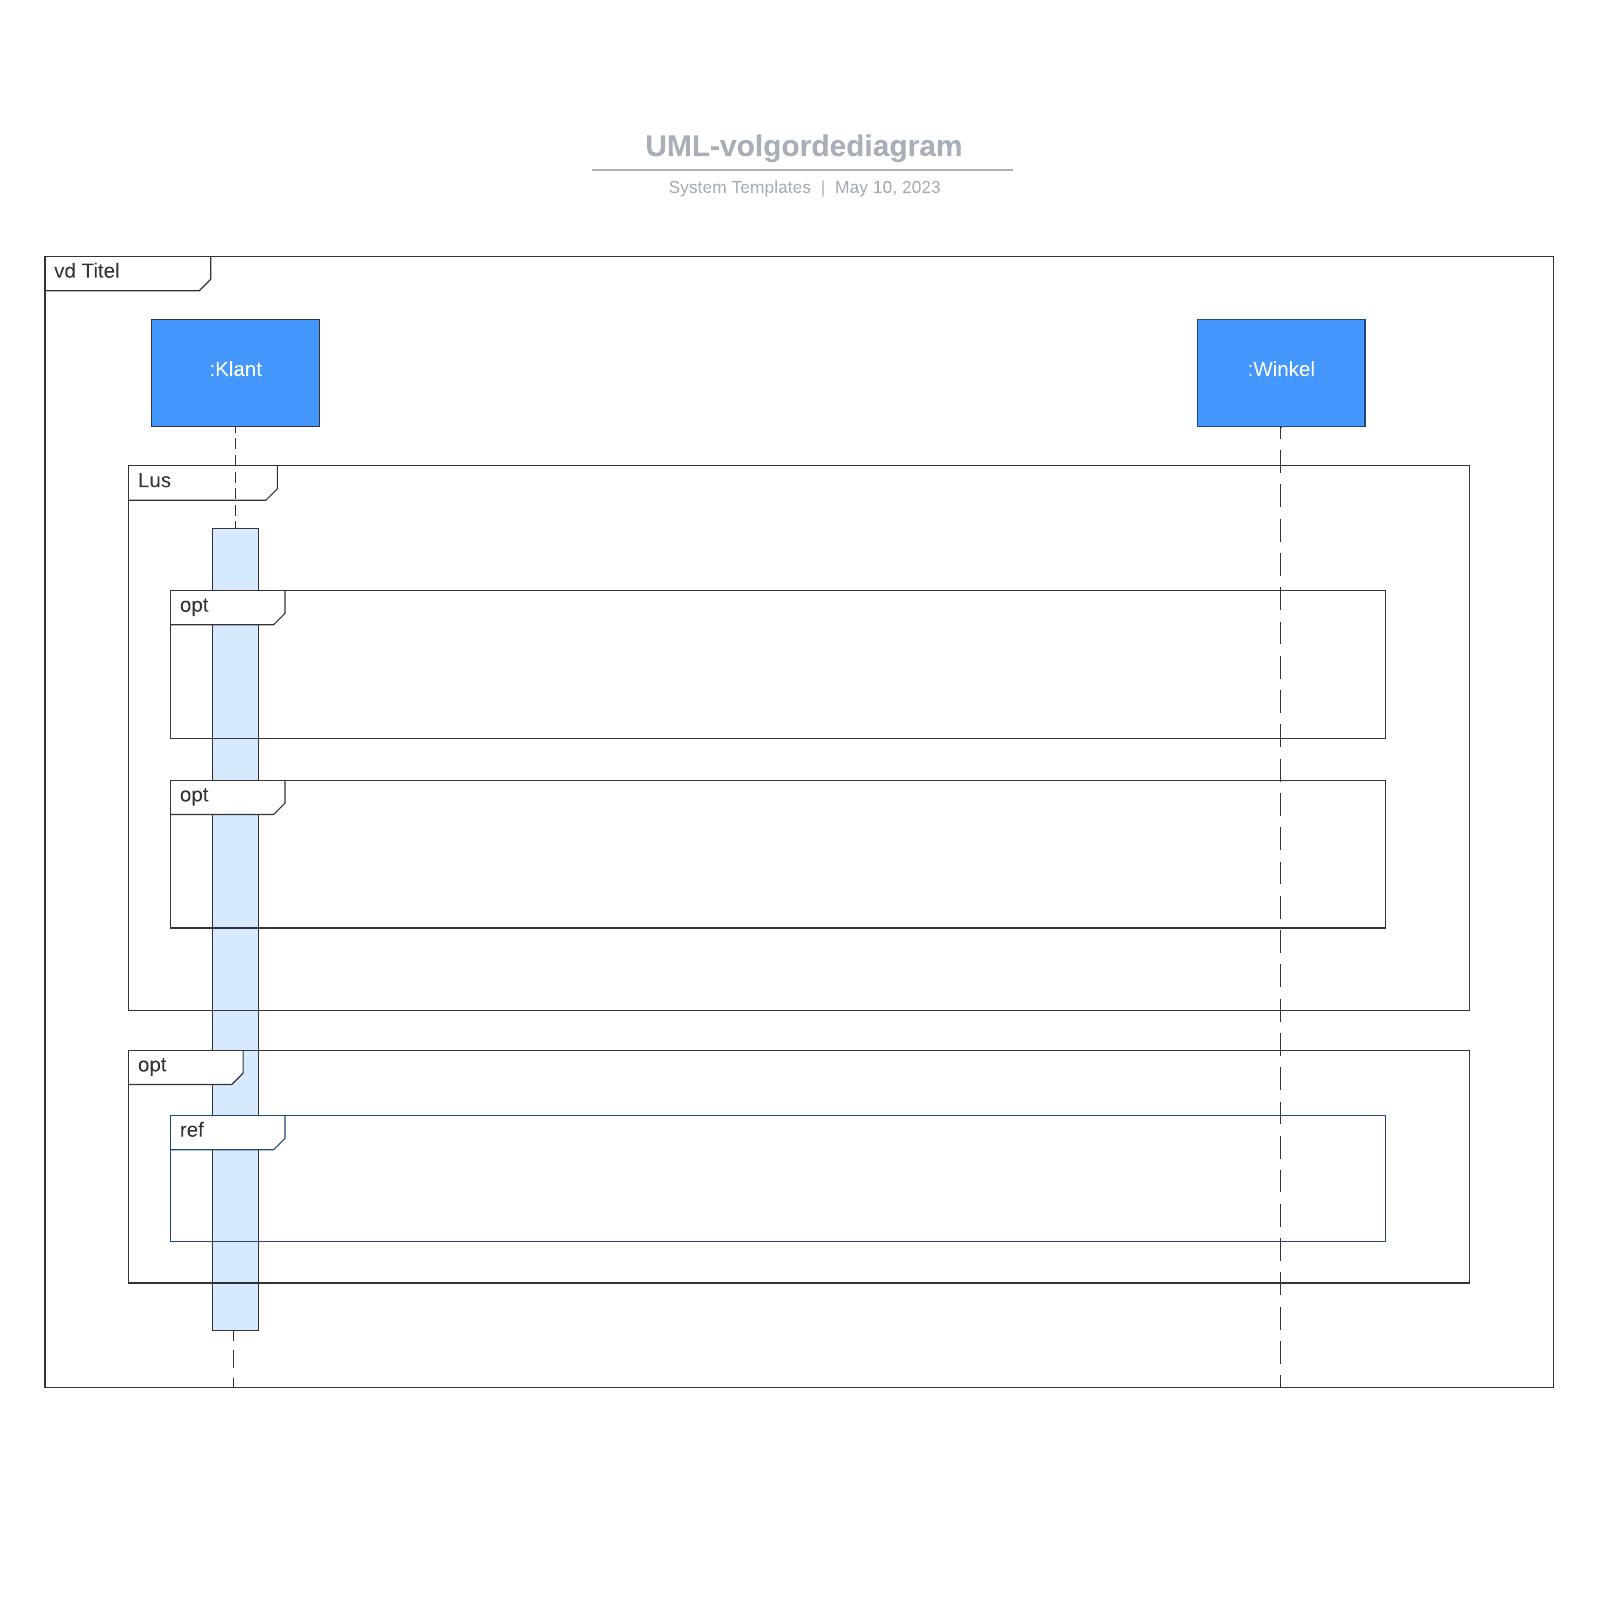 UML-volgordediagram